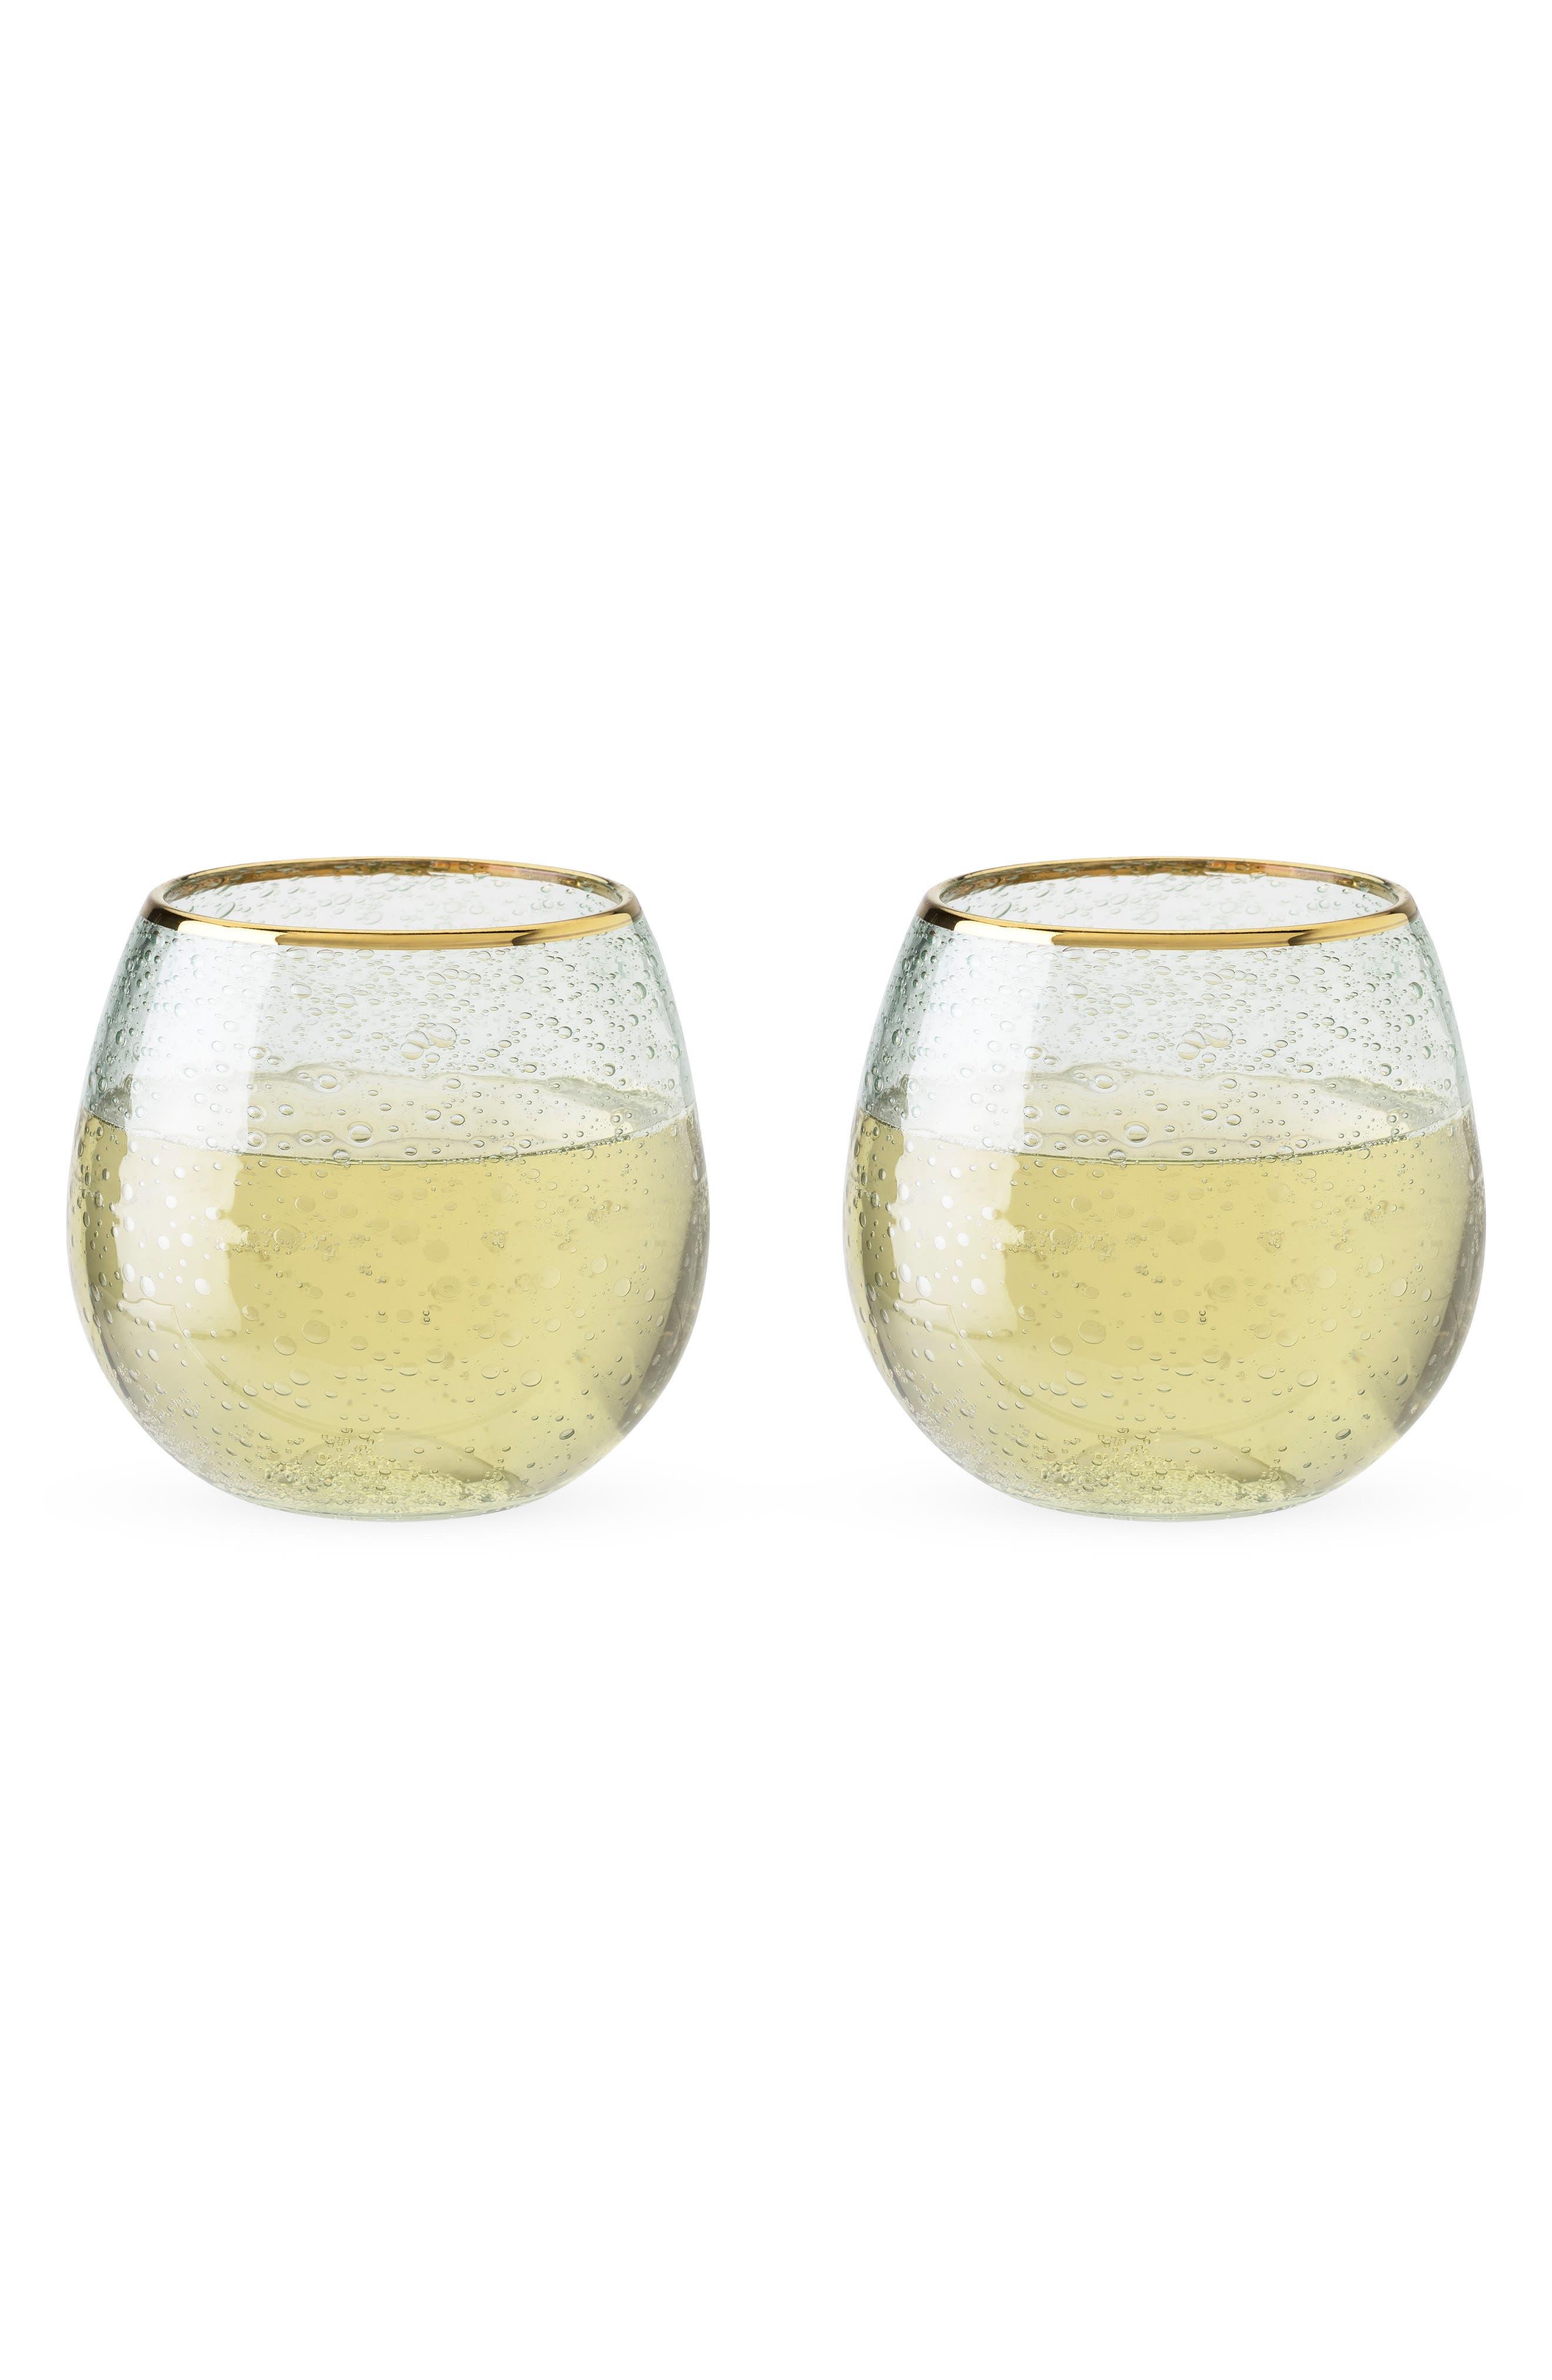 Set of 2 Gold Rim Stemless Wine Glasses,                             Alternate thumbnail 2, color,                             100